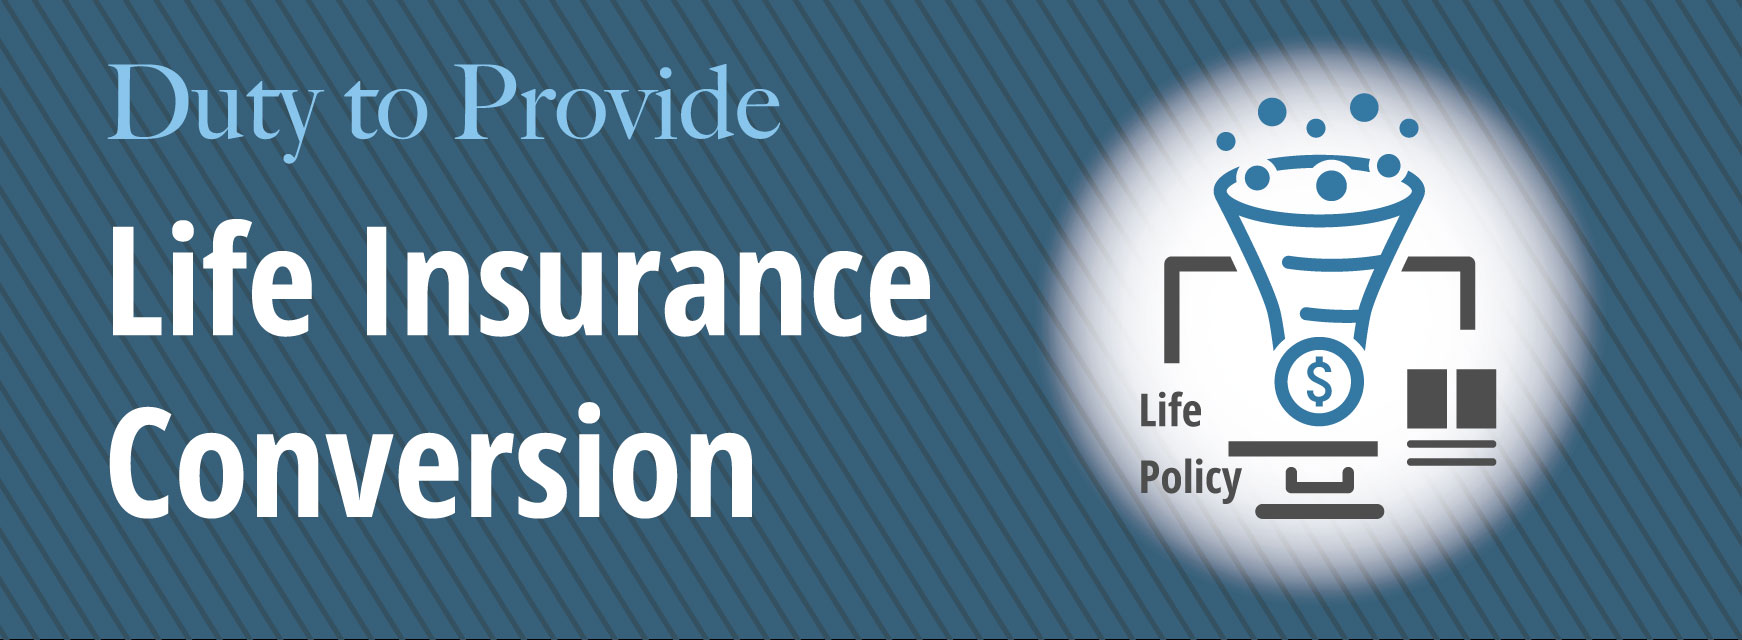 life-insurance-conversion.jpg